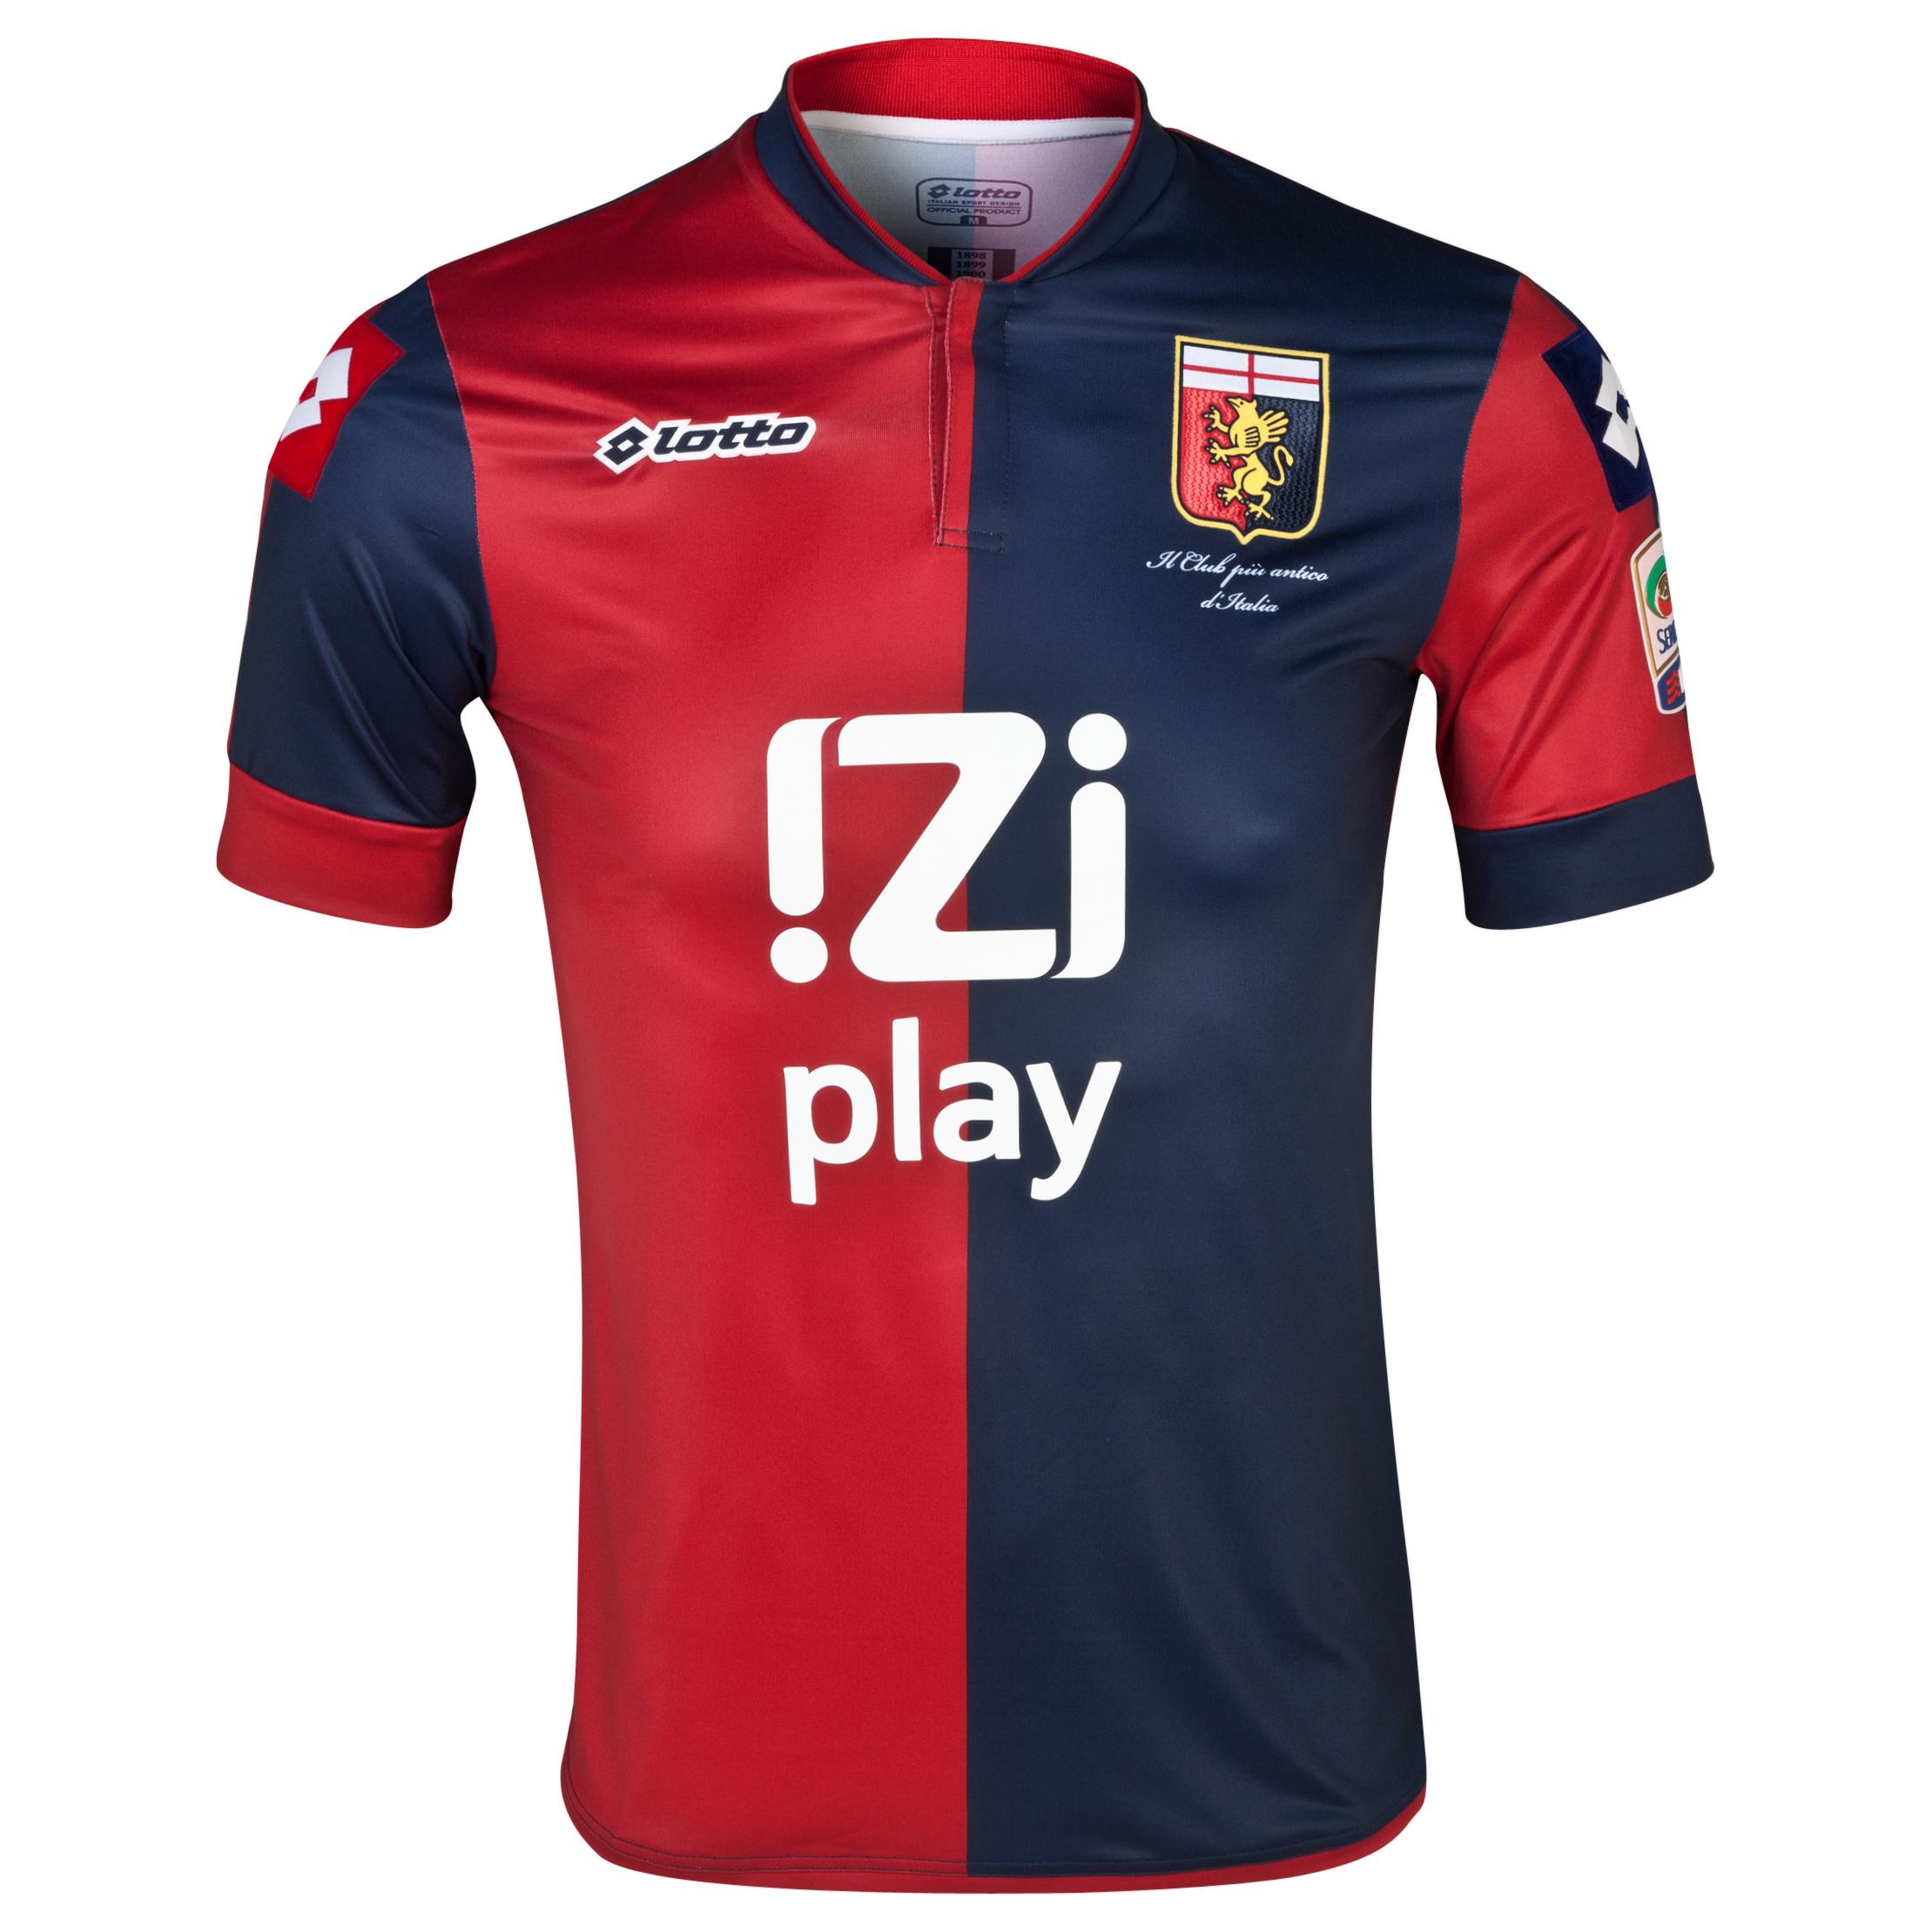 Genoa Home Shirt 2013/14